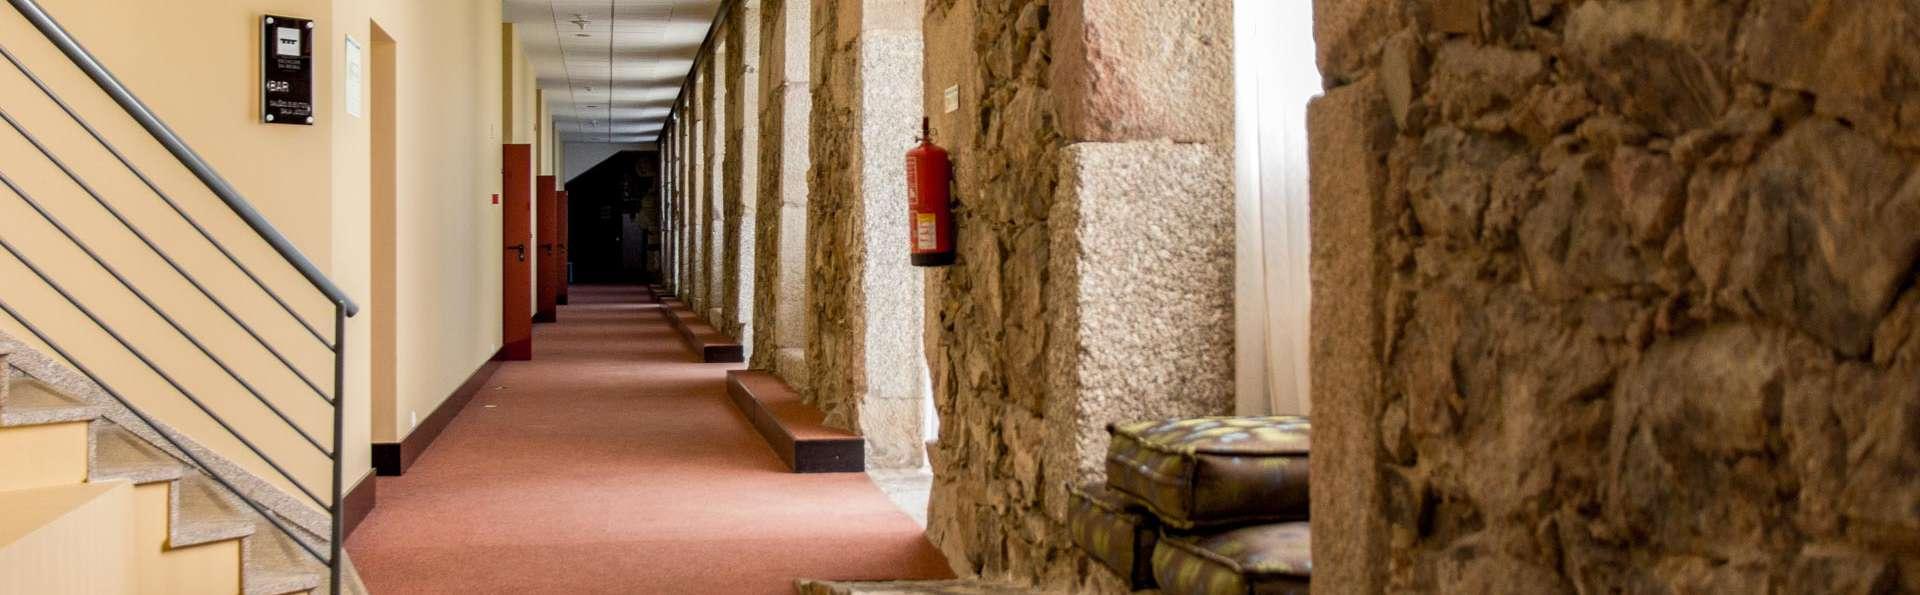 Hotel Principe da Beira - EDIT_HALL_01.jpg